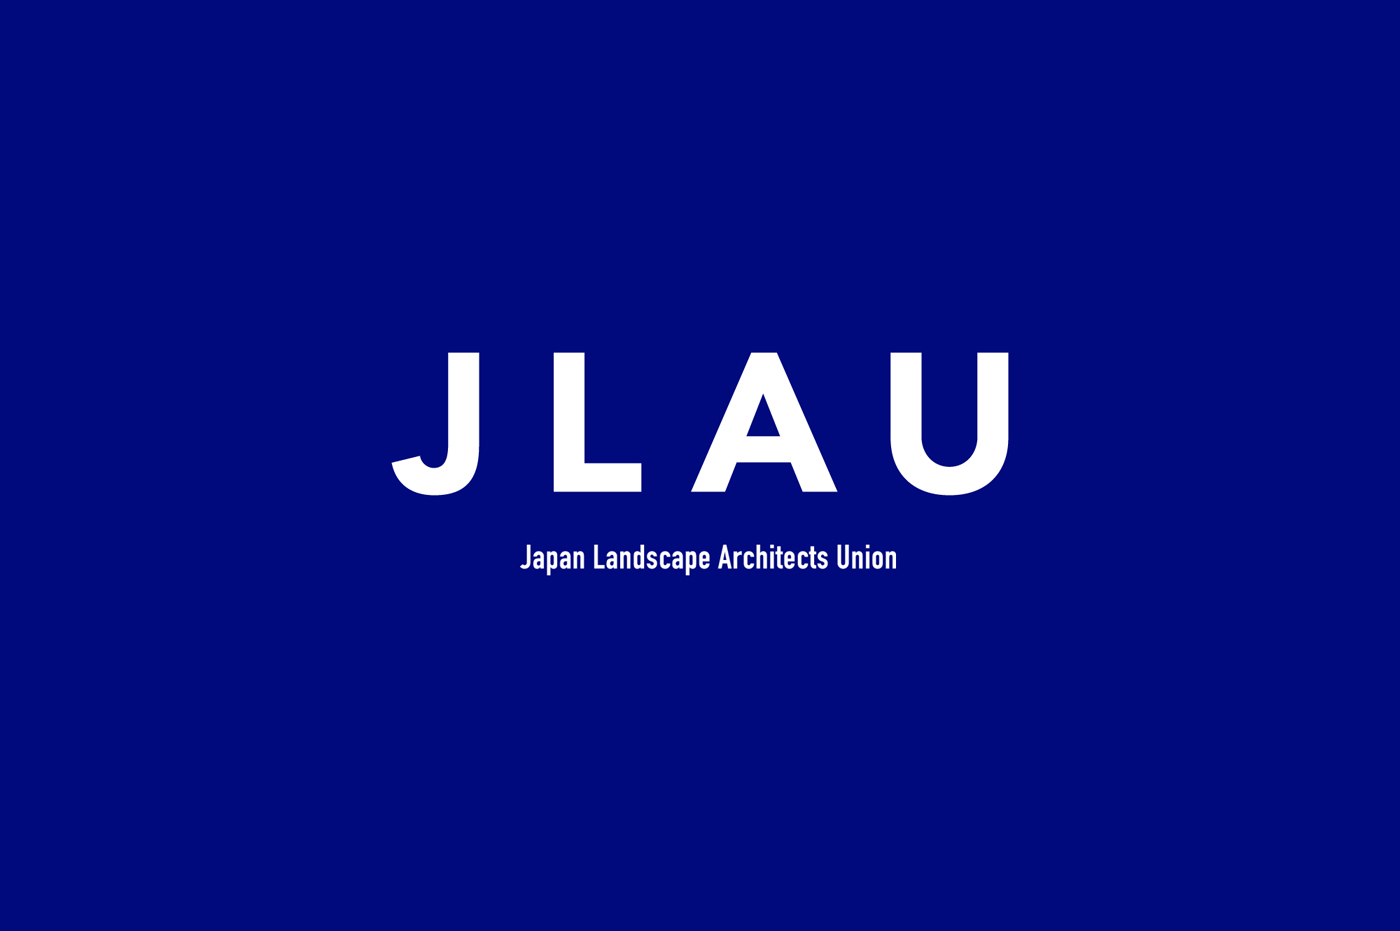 jlau_01